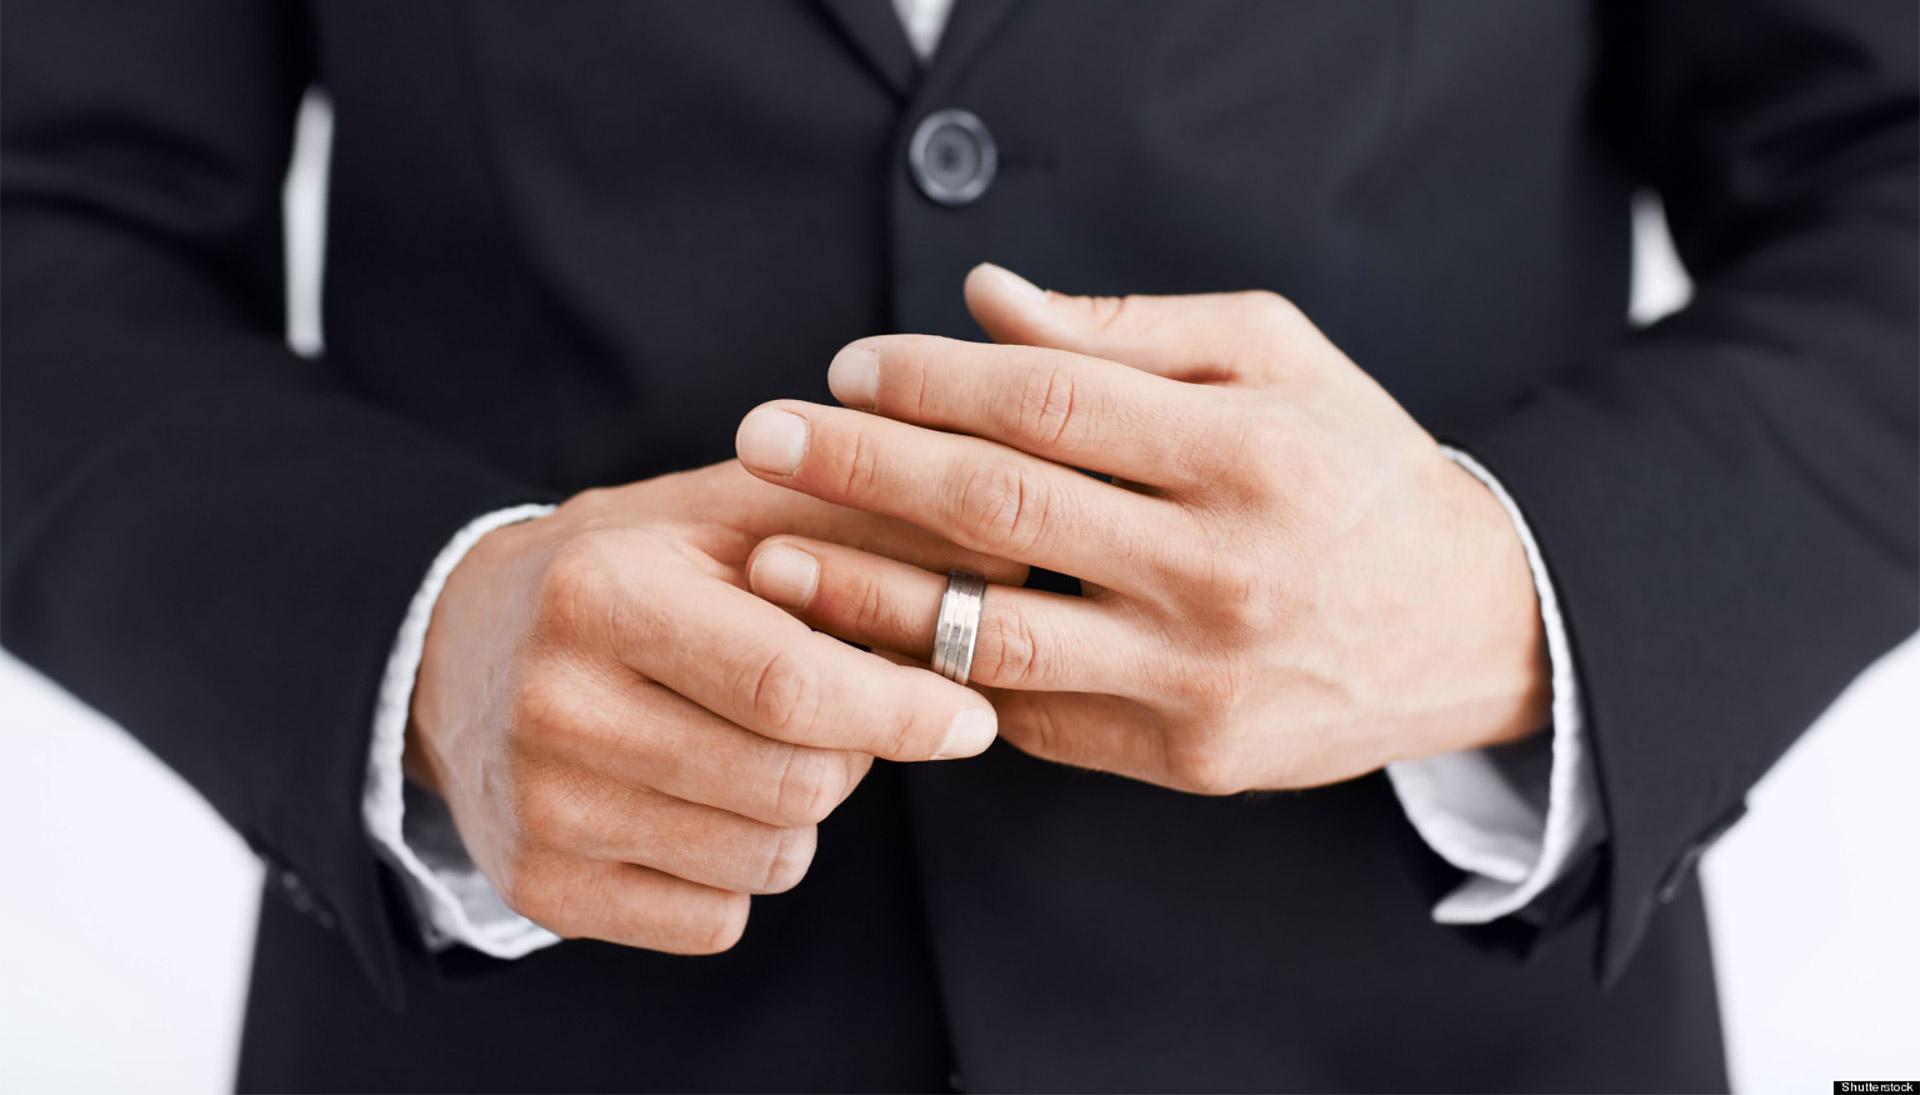 Investigazioni per infedeltà coniugale